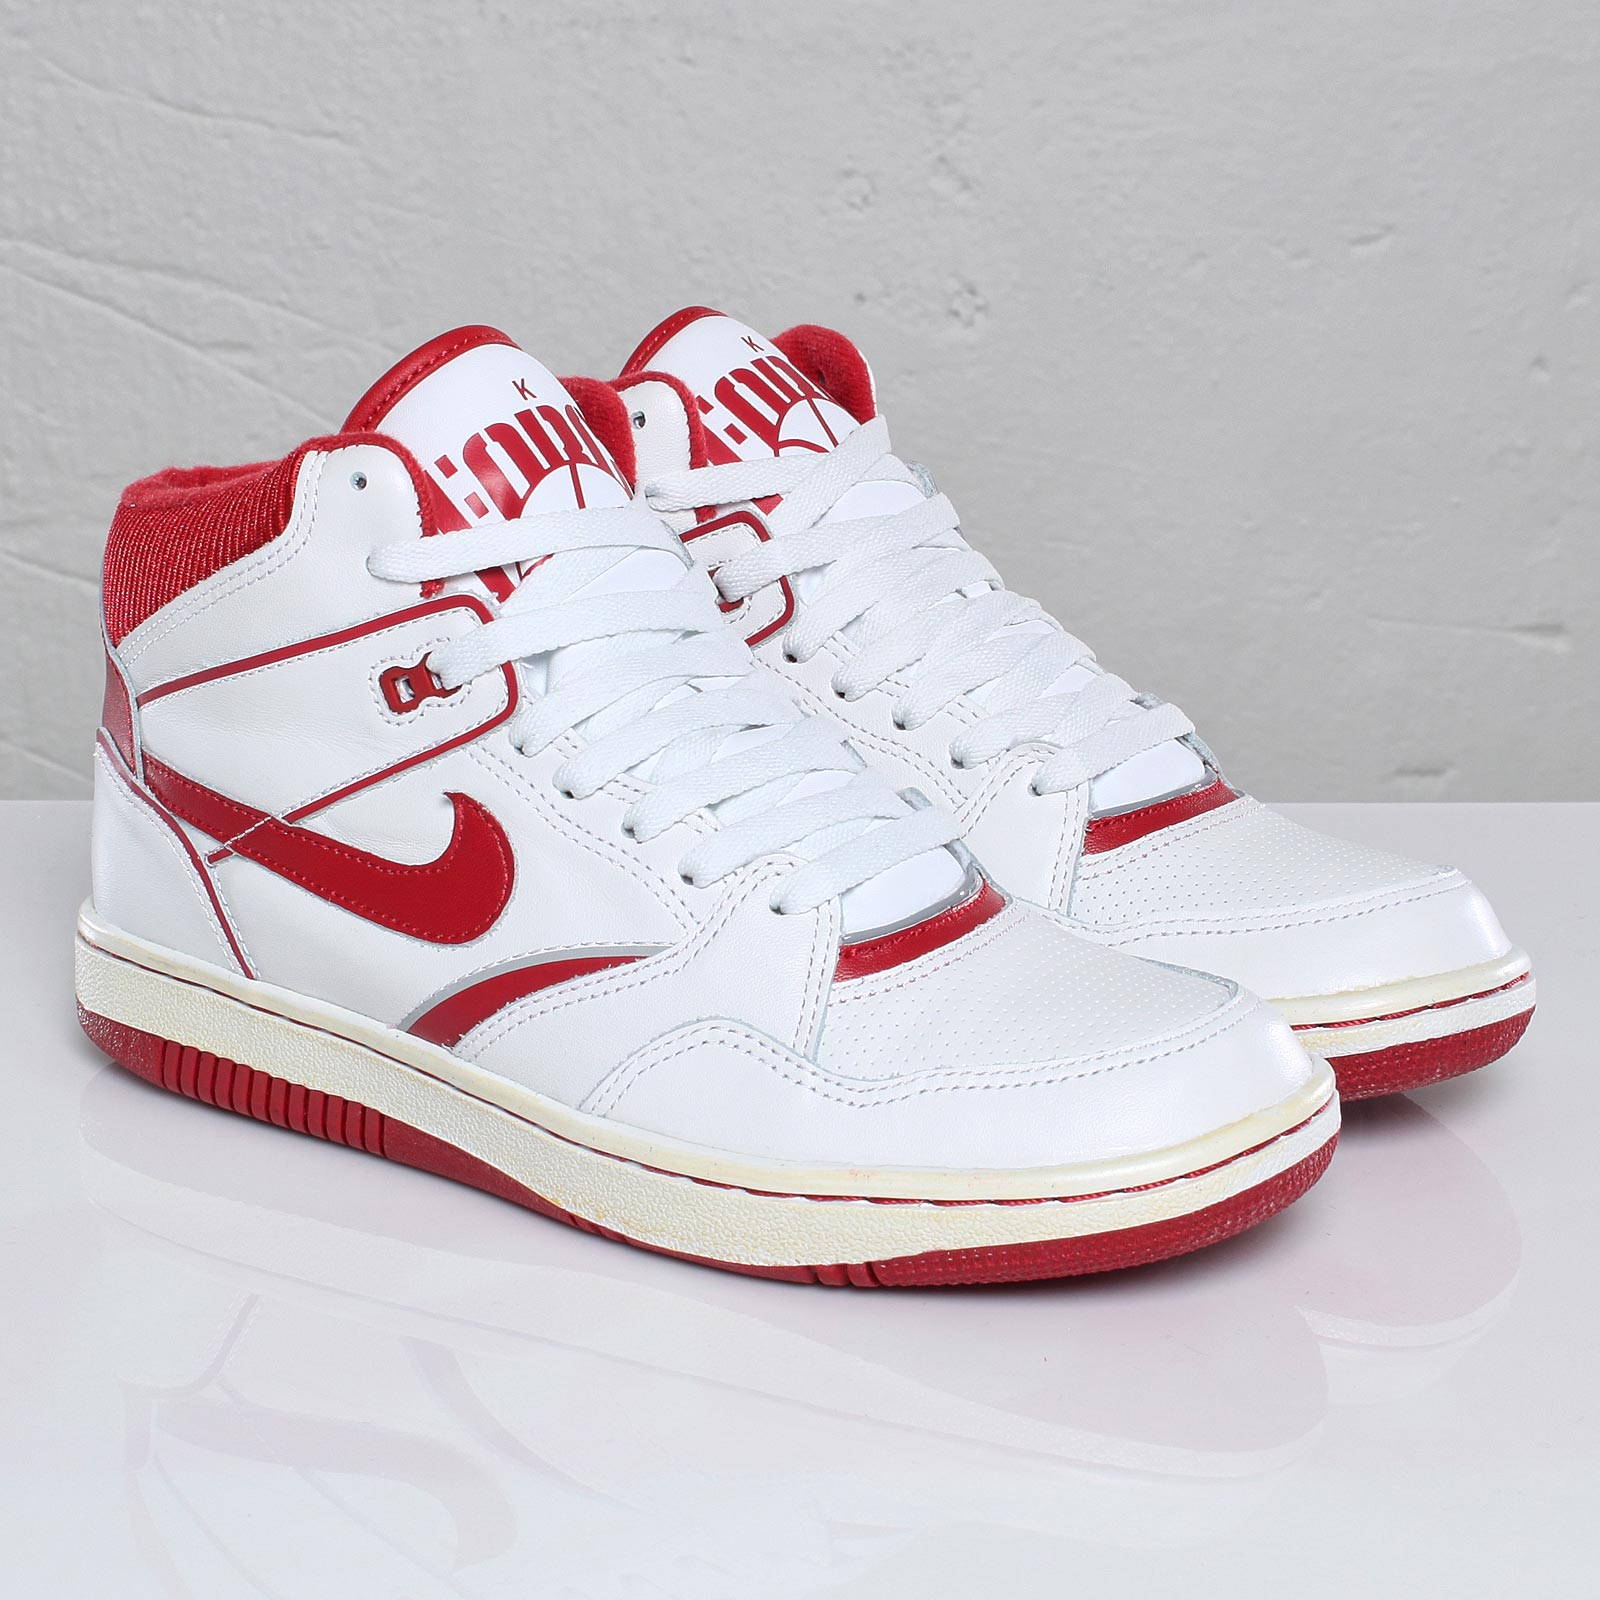 4ecdf248a75c Nike Sky Force 88 Mid (VNTG) - 100715 - Sneakersnstuff